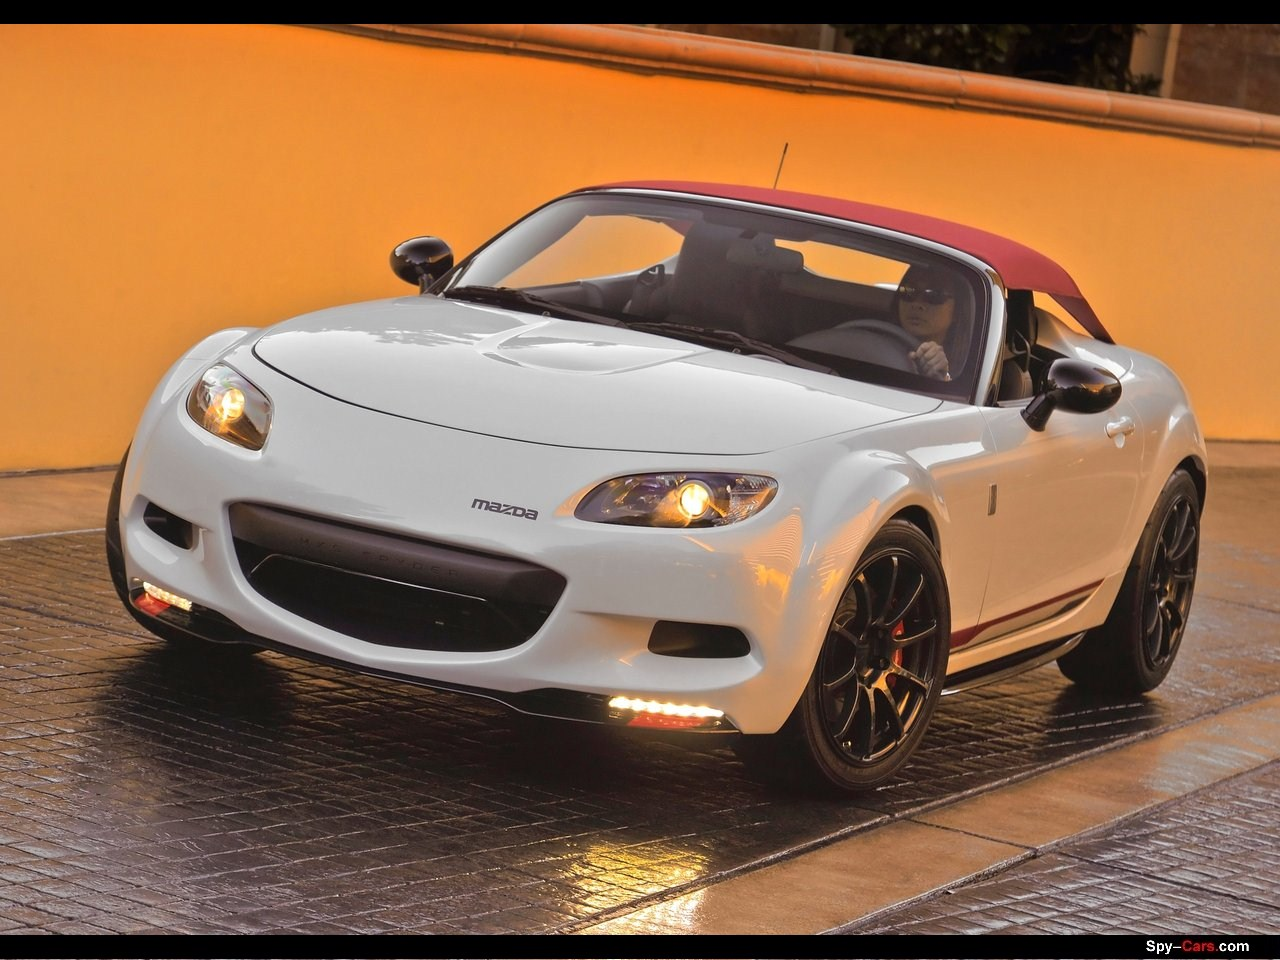 http://2.bp.blogspot.com/-H4-CBt0rDE8/TrO8vmPWLhI/AAAAAAACRVo/j2KT0uv3ohI/s1600/Mazda-MX-5_Spyder_Concept_2011_004.jpg